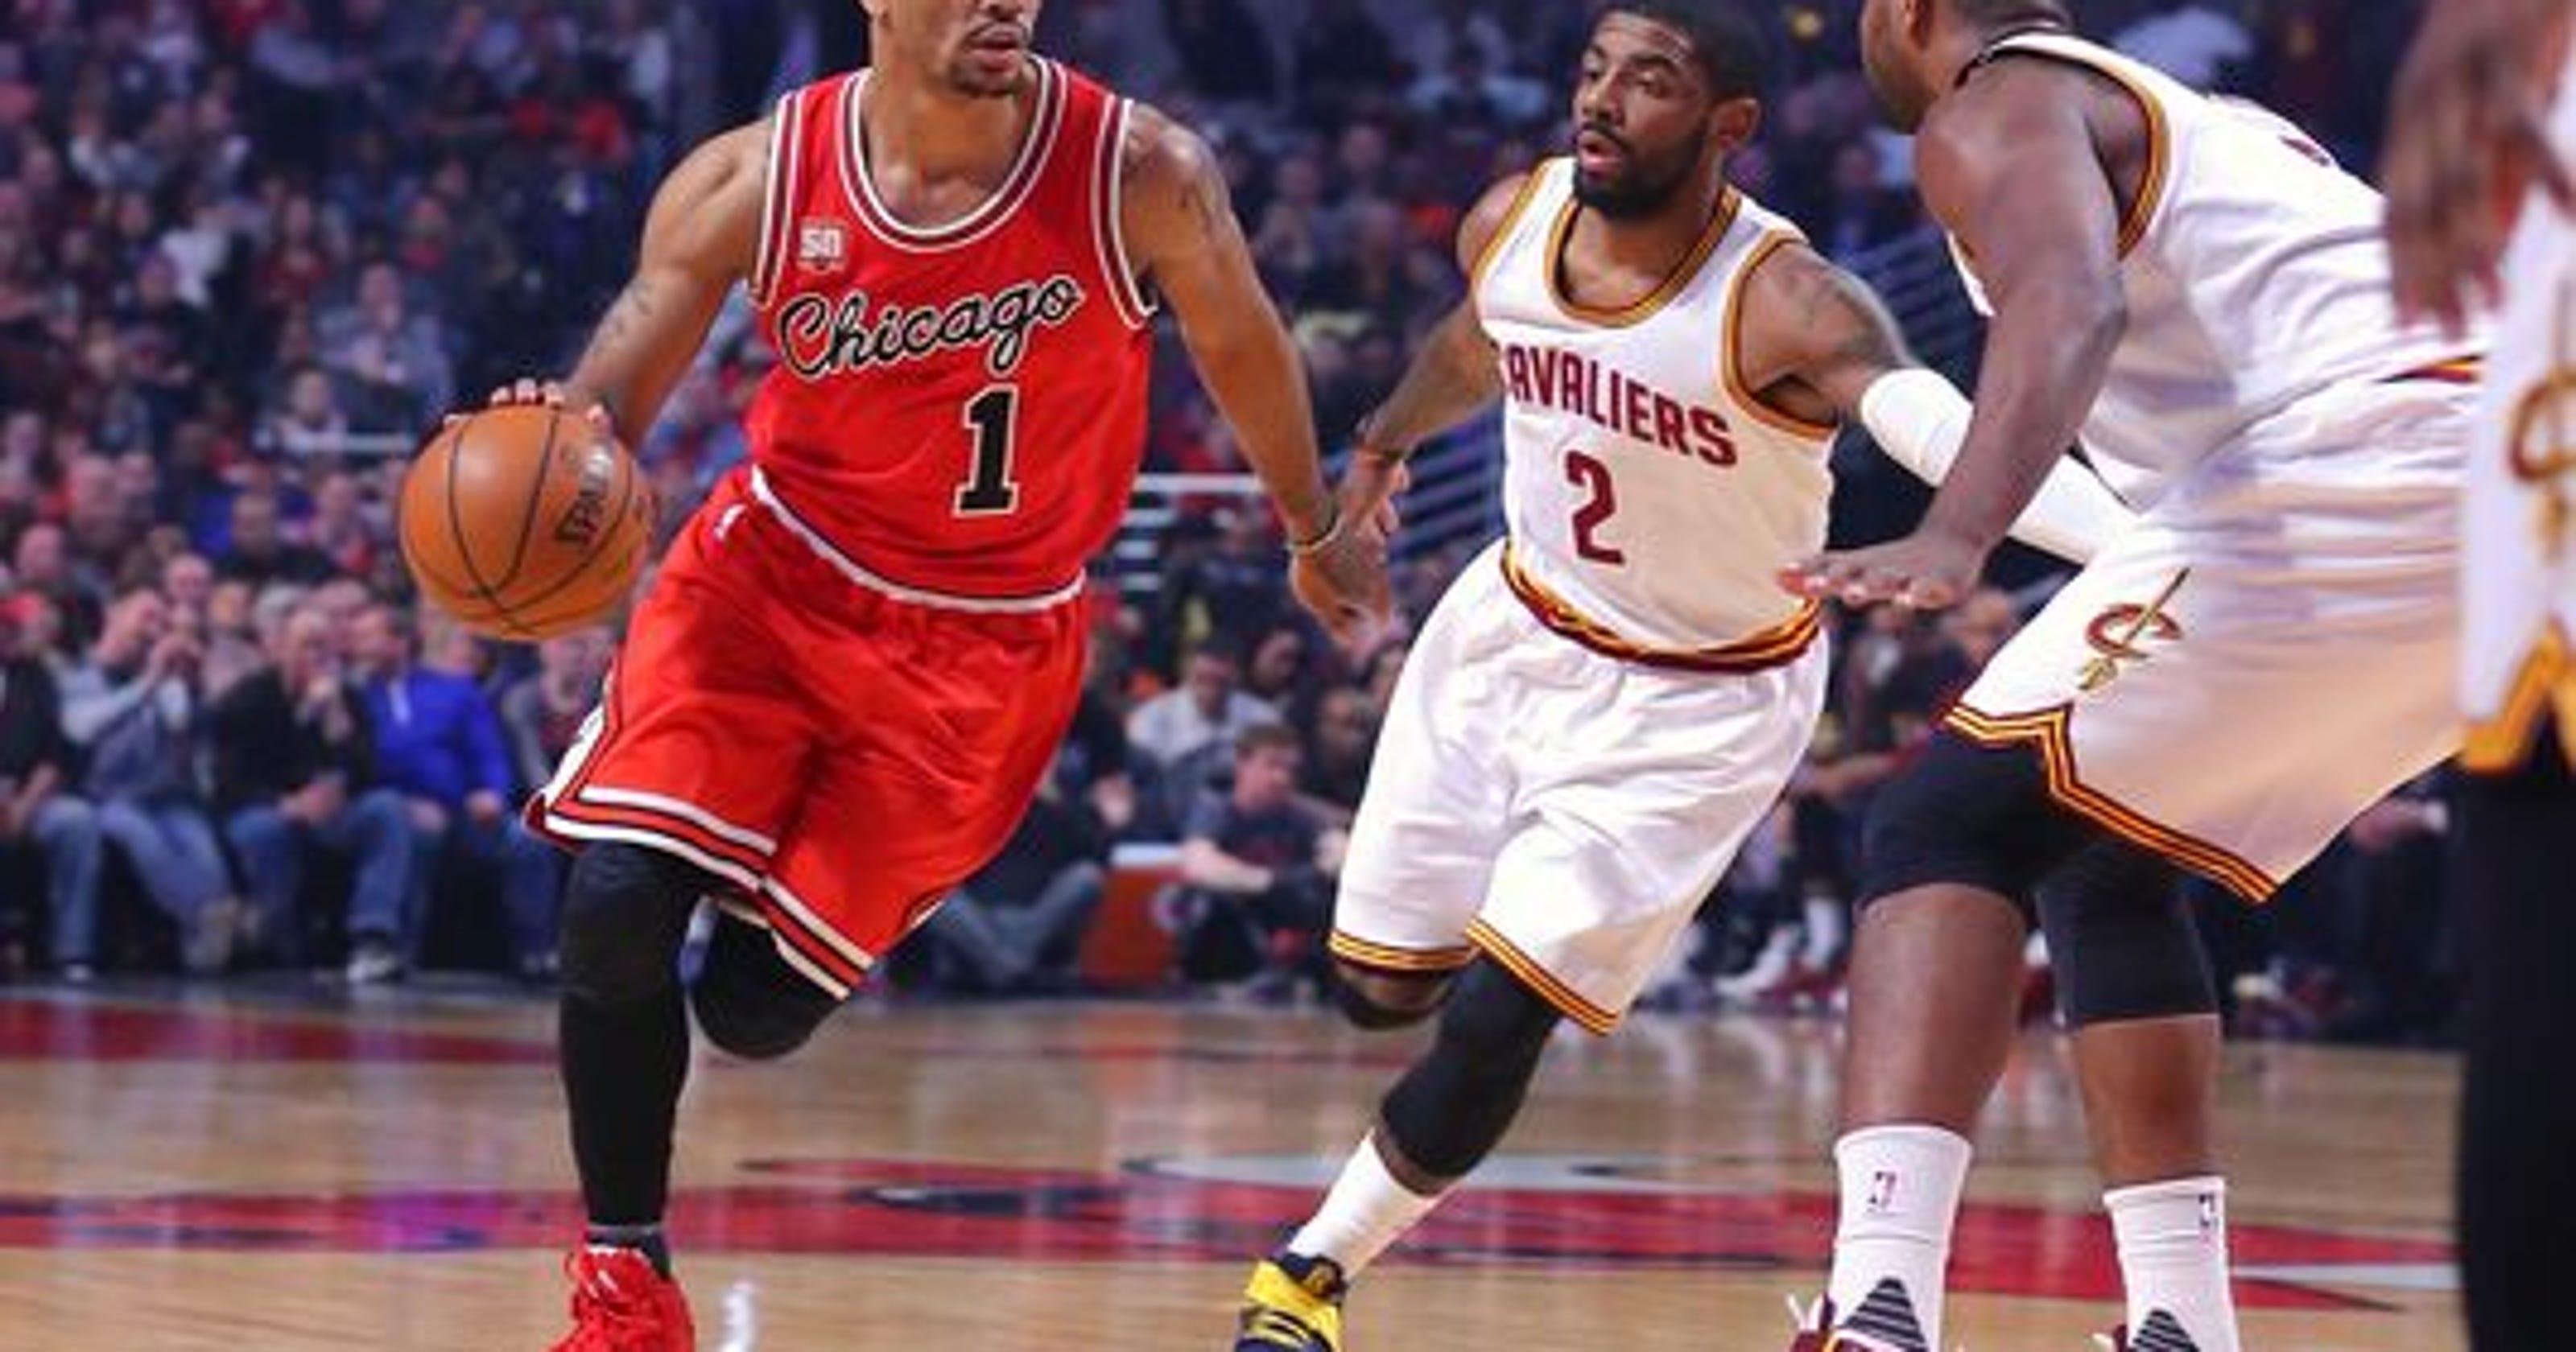 Chicago Bulls trade Derrick Rose to the New York Knicks 29f6d5b66